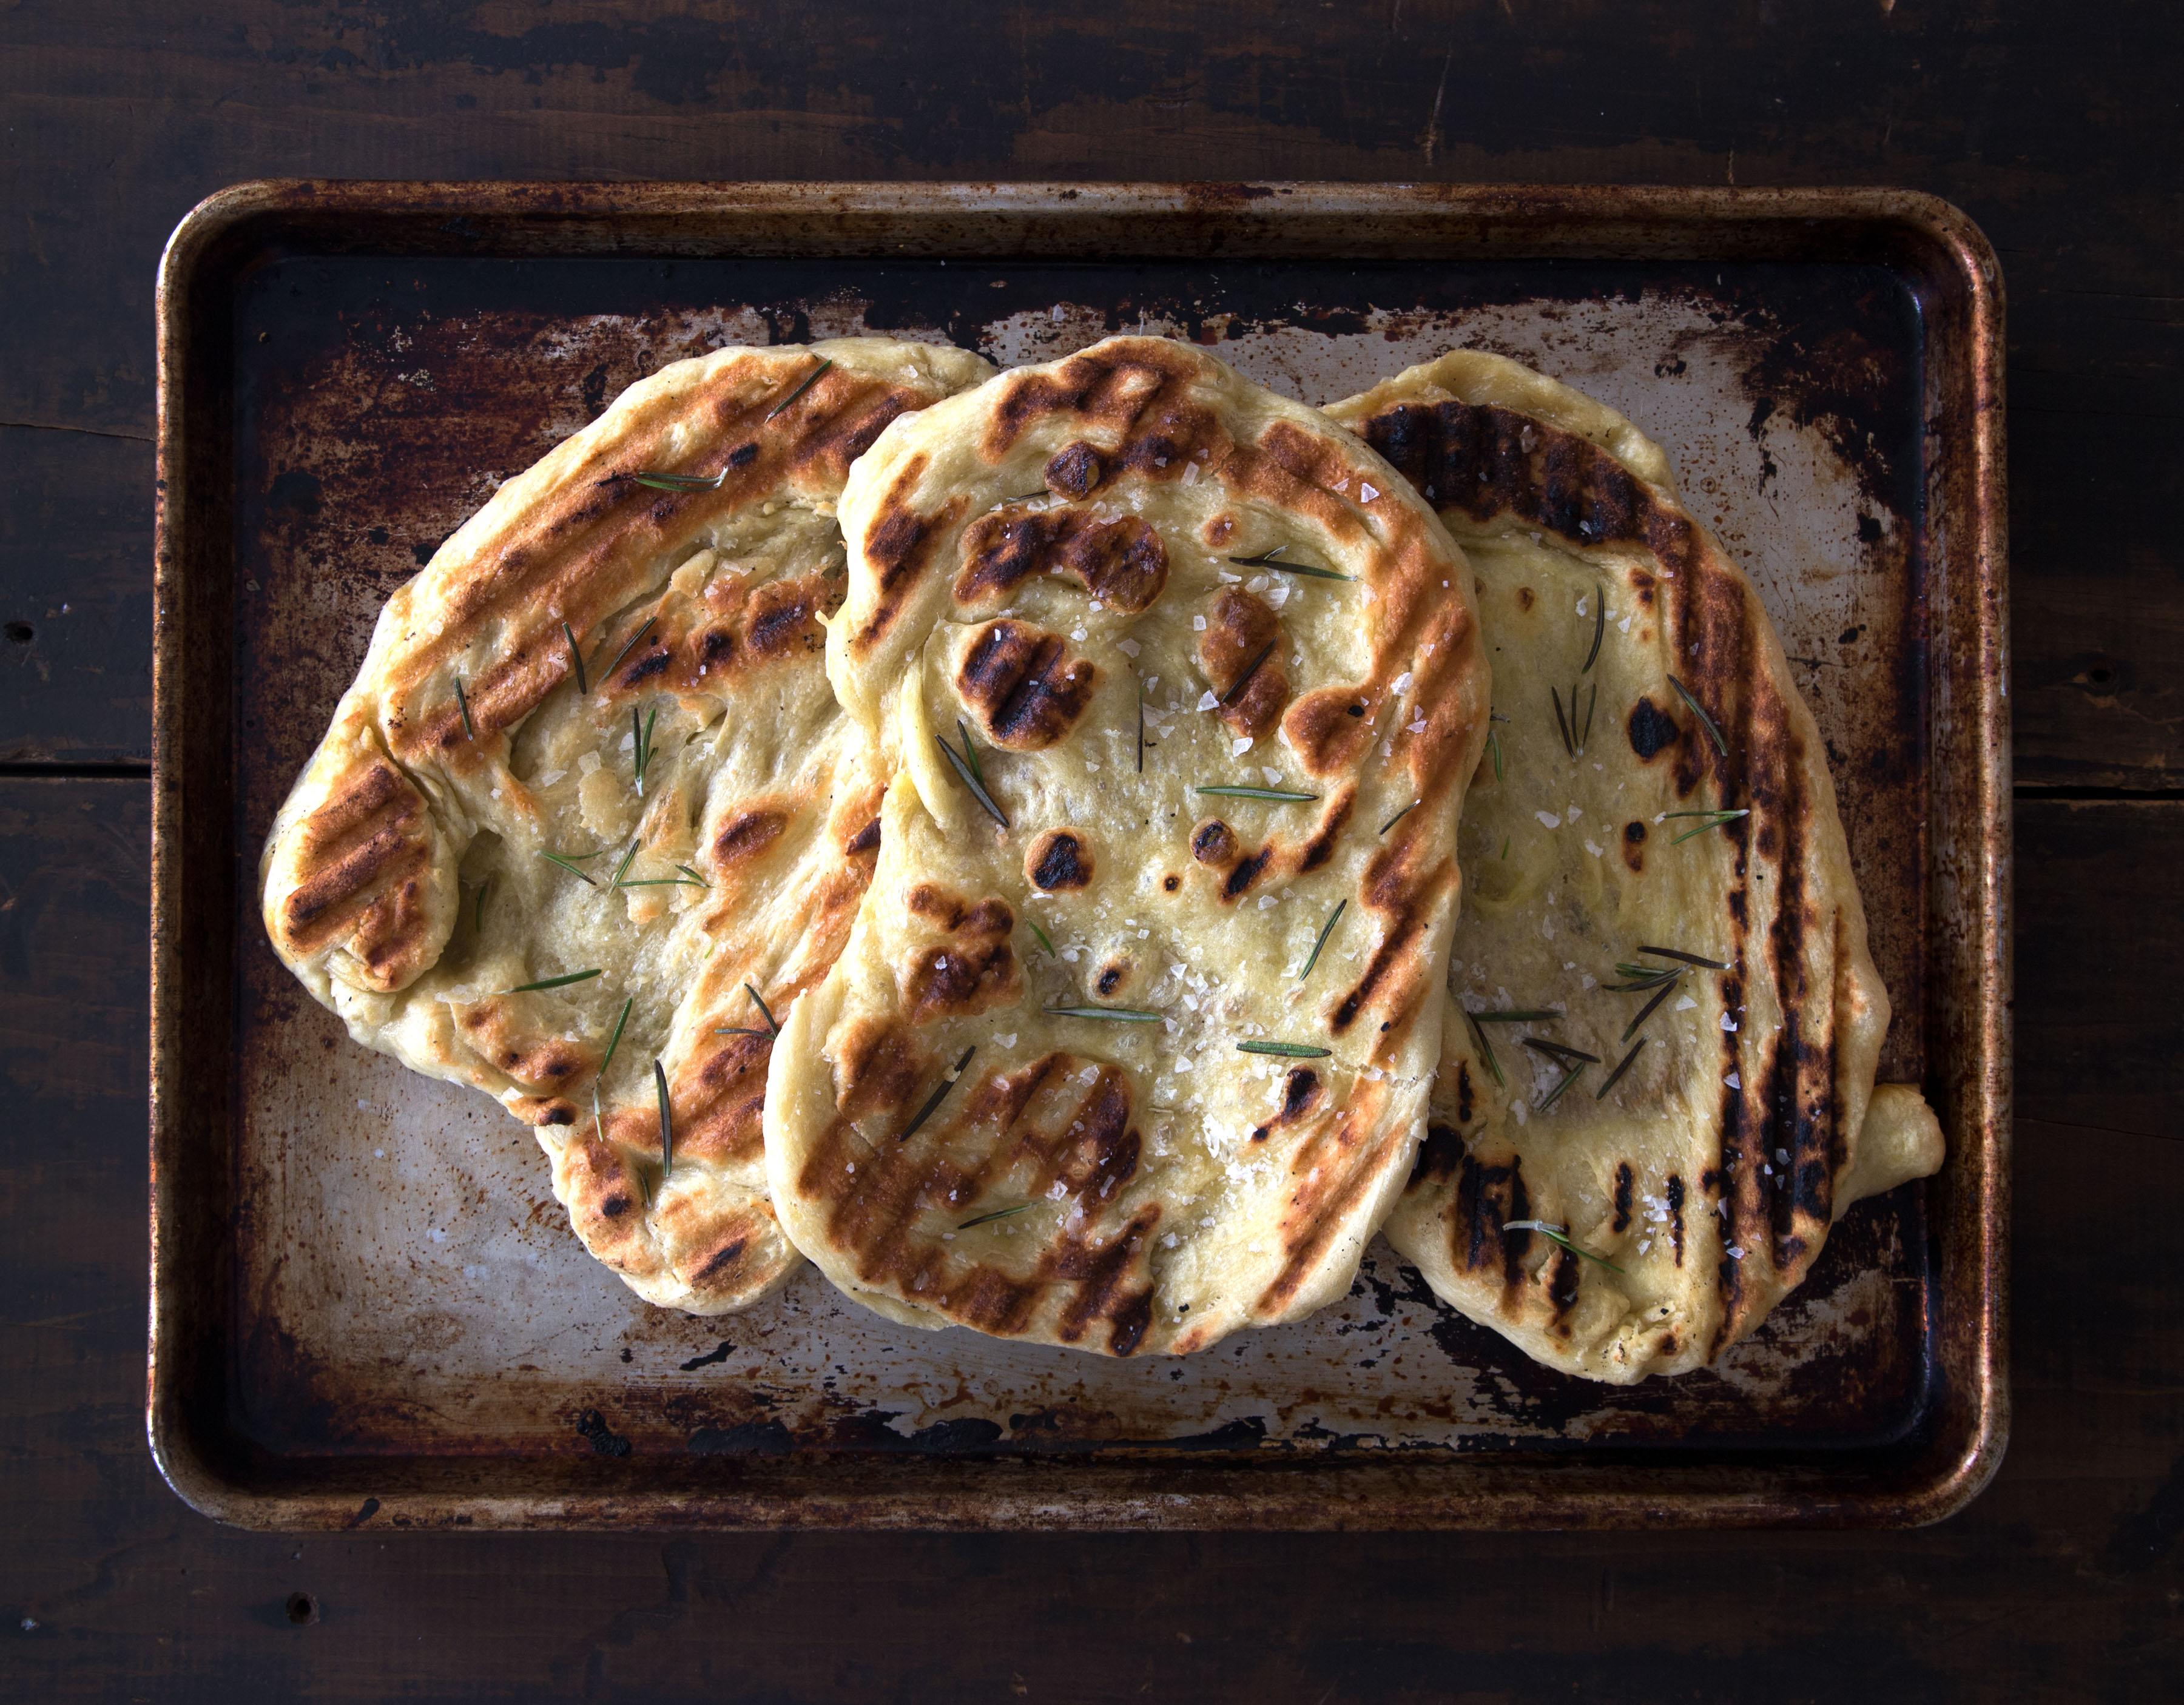 Baking Basics -- How to Make Grilled Flatbread